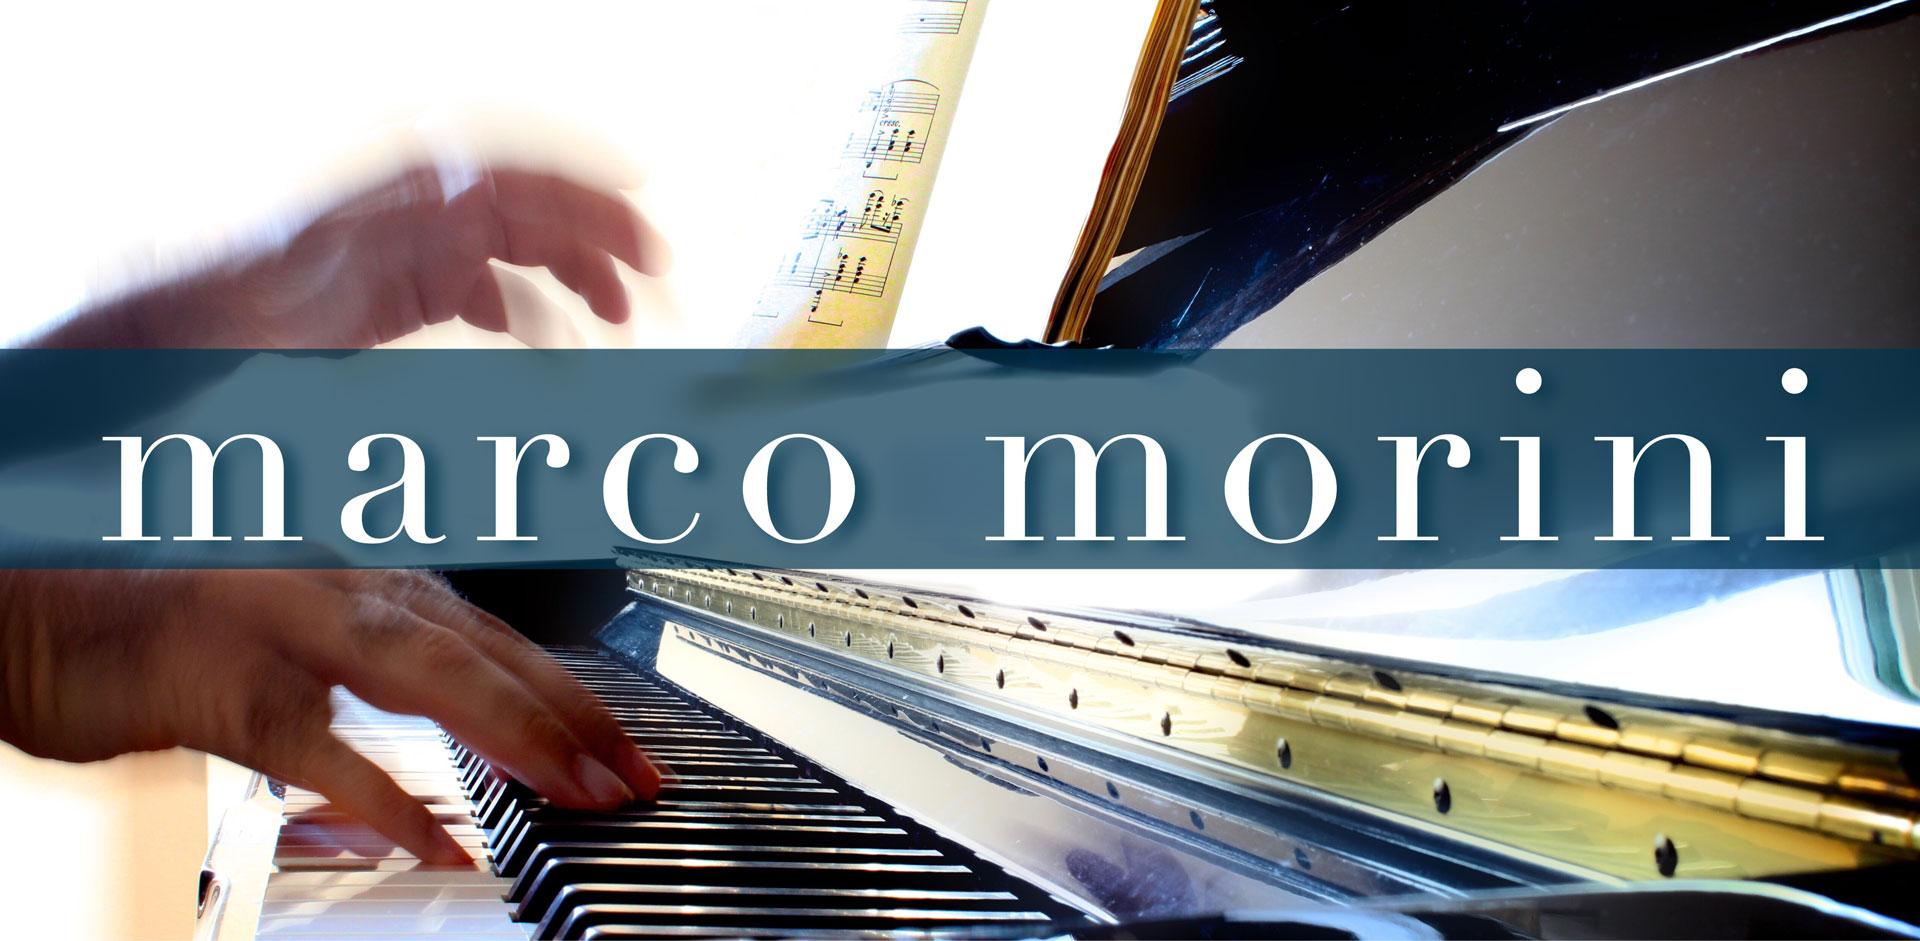 Marco Morini Music Composer